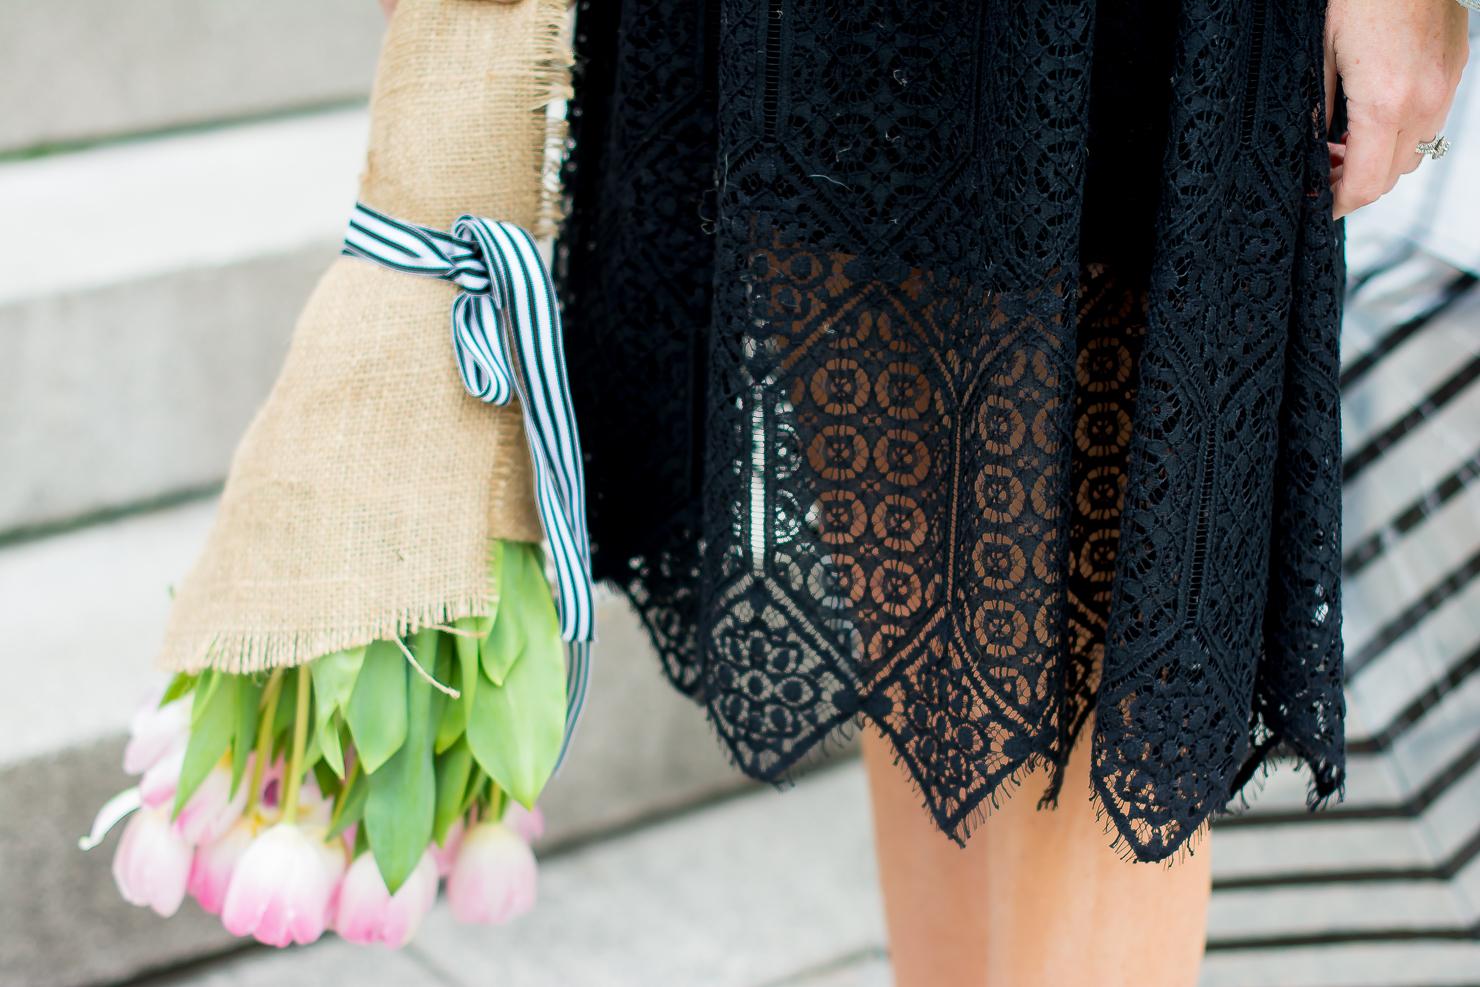 13caaccb56 H&M-black-lace-midi-dress-merona-denim-jacket-adidas-neo-clean -sneakers-pink-tulips-striped-bubble-umbrella-chicago-art-institute-30